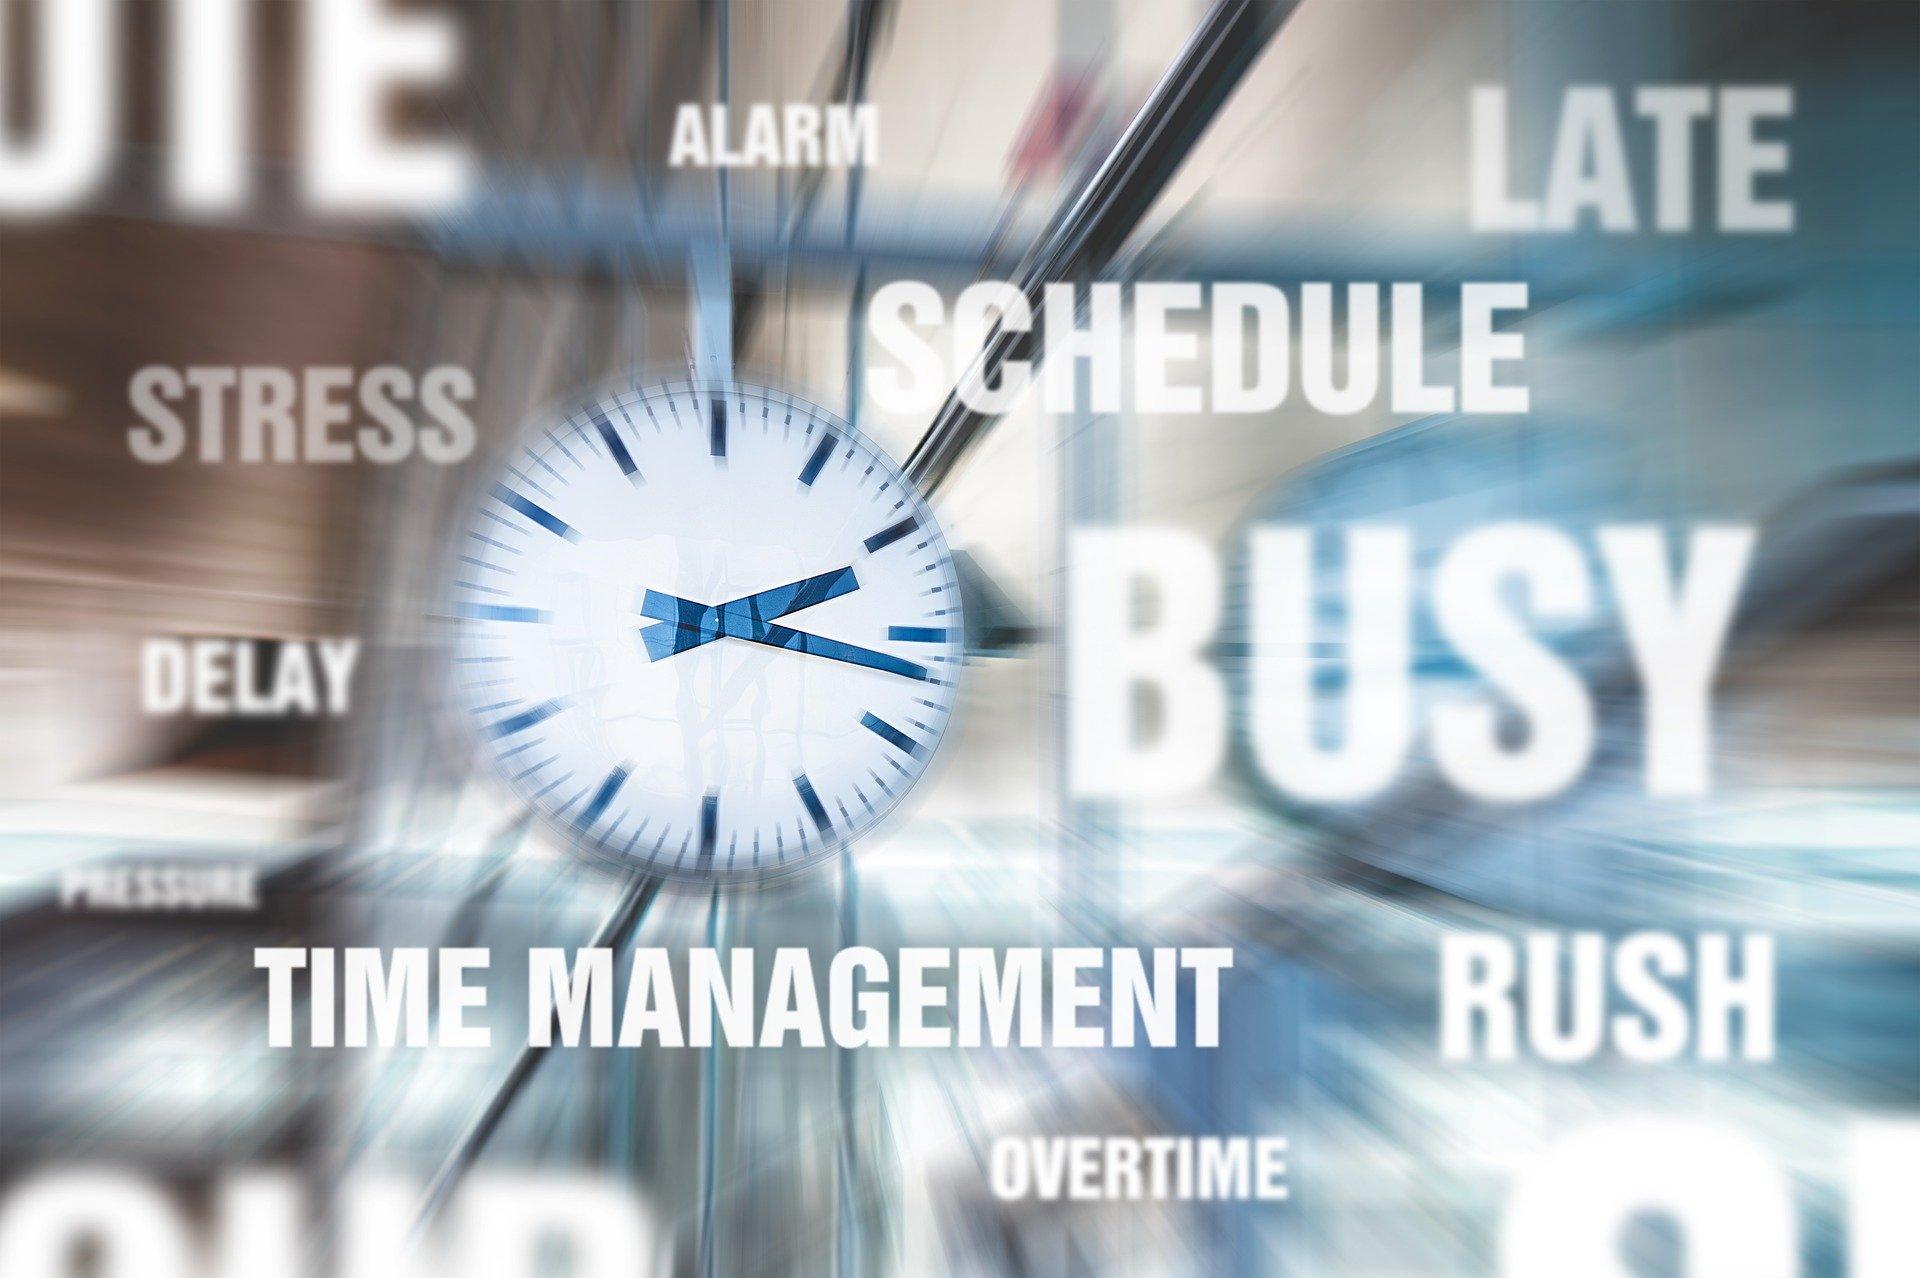 Zeitarbeit-Kredit-trotz-befristetem-arbeitsvertrag